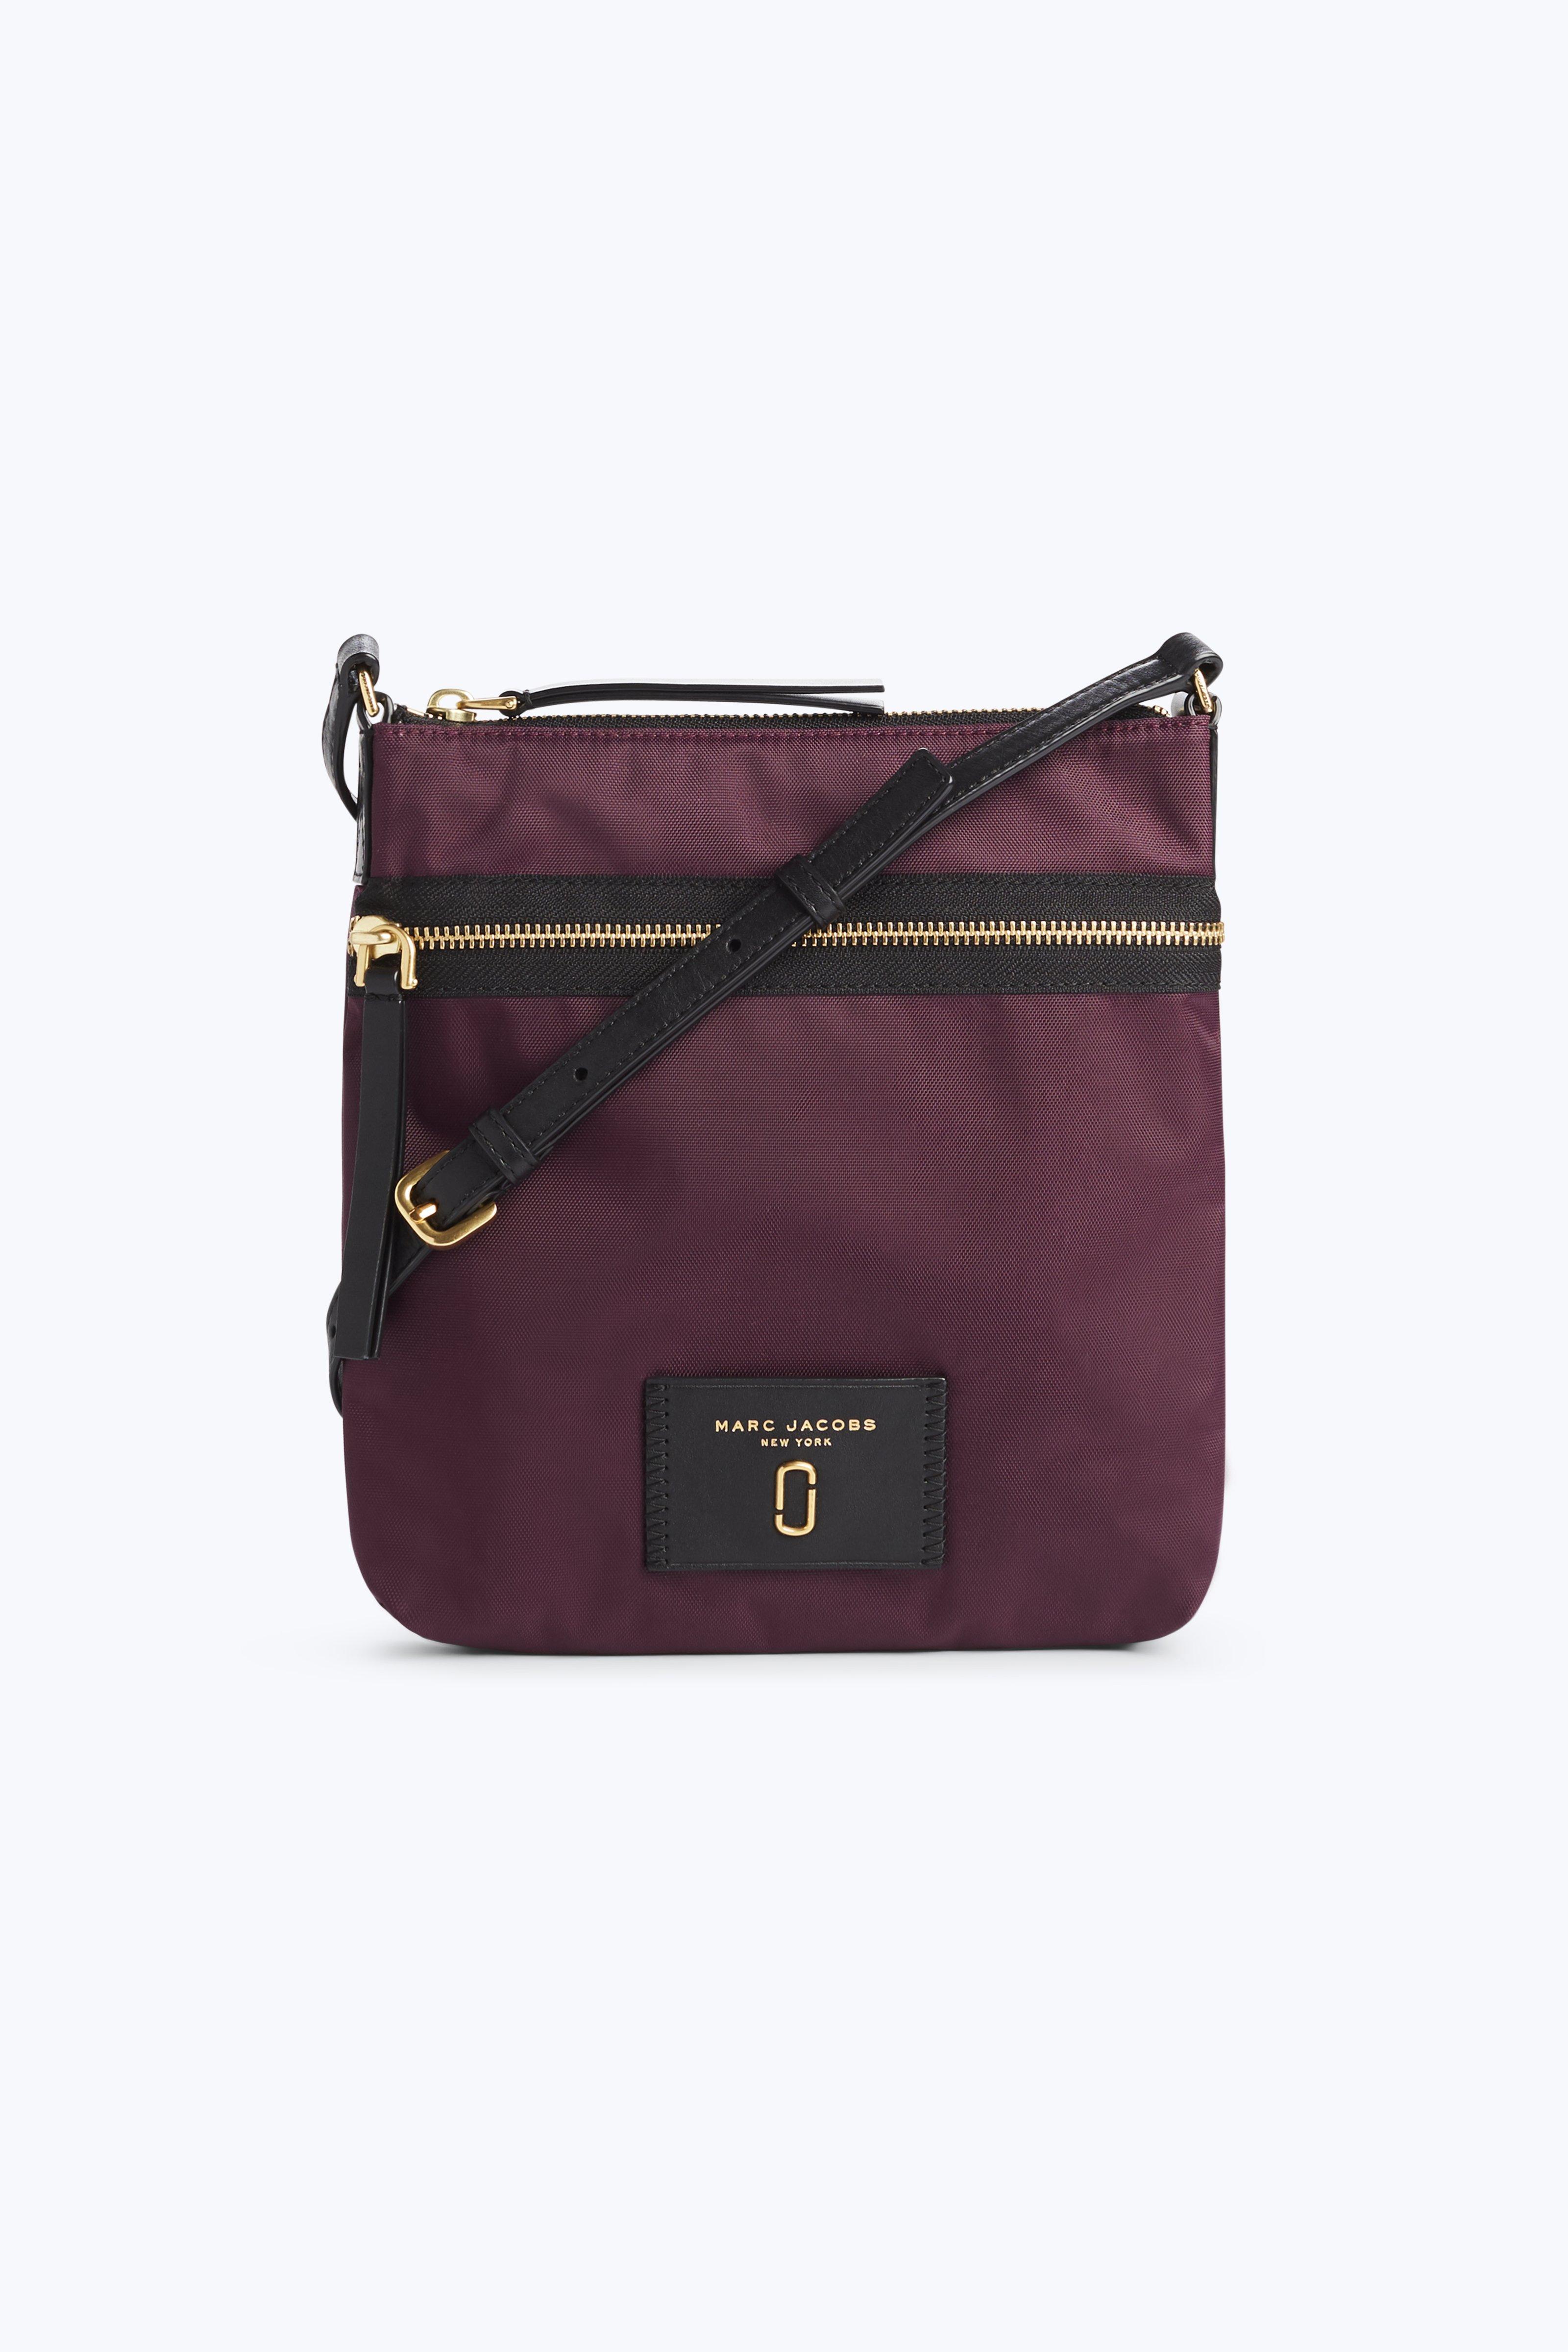 c2328738afa2 Marc Jacobs Nylon Biker Ns Crossbody Bag In Dark Violet